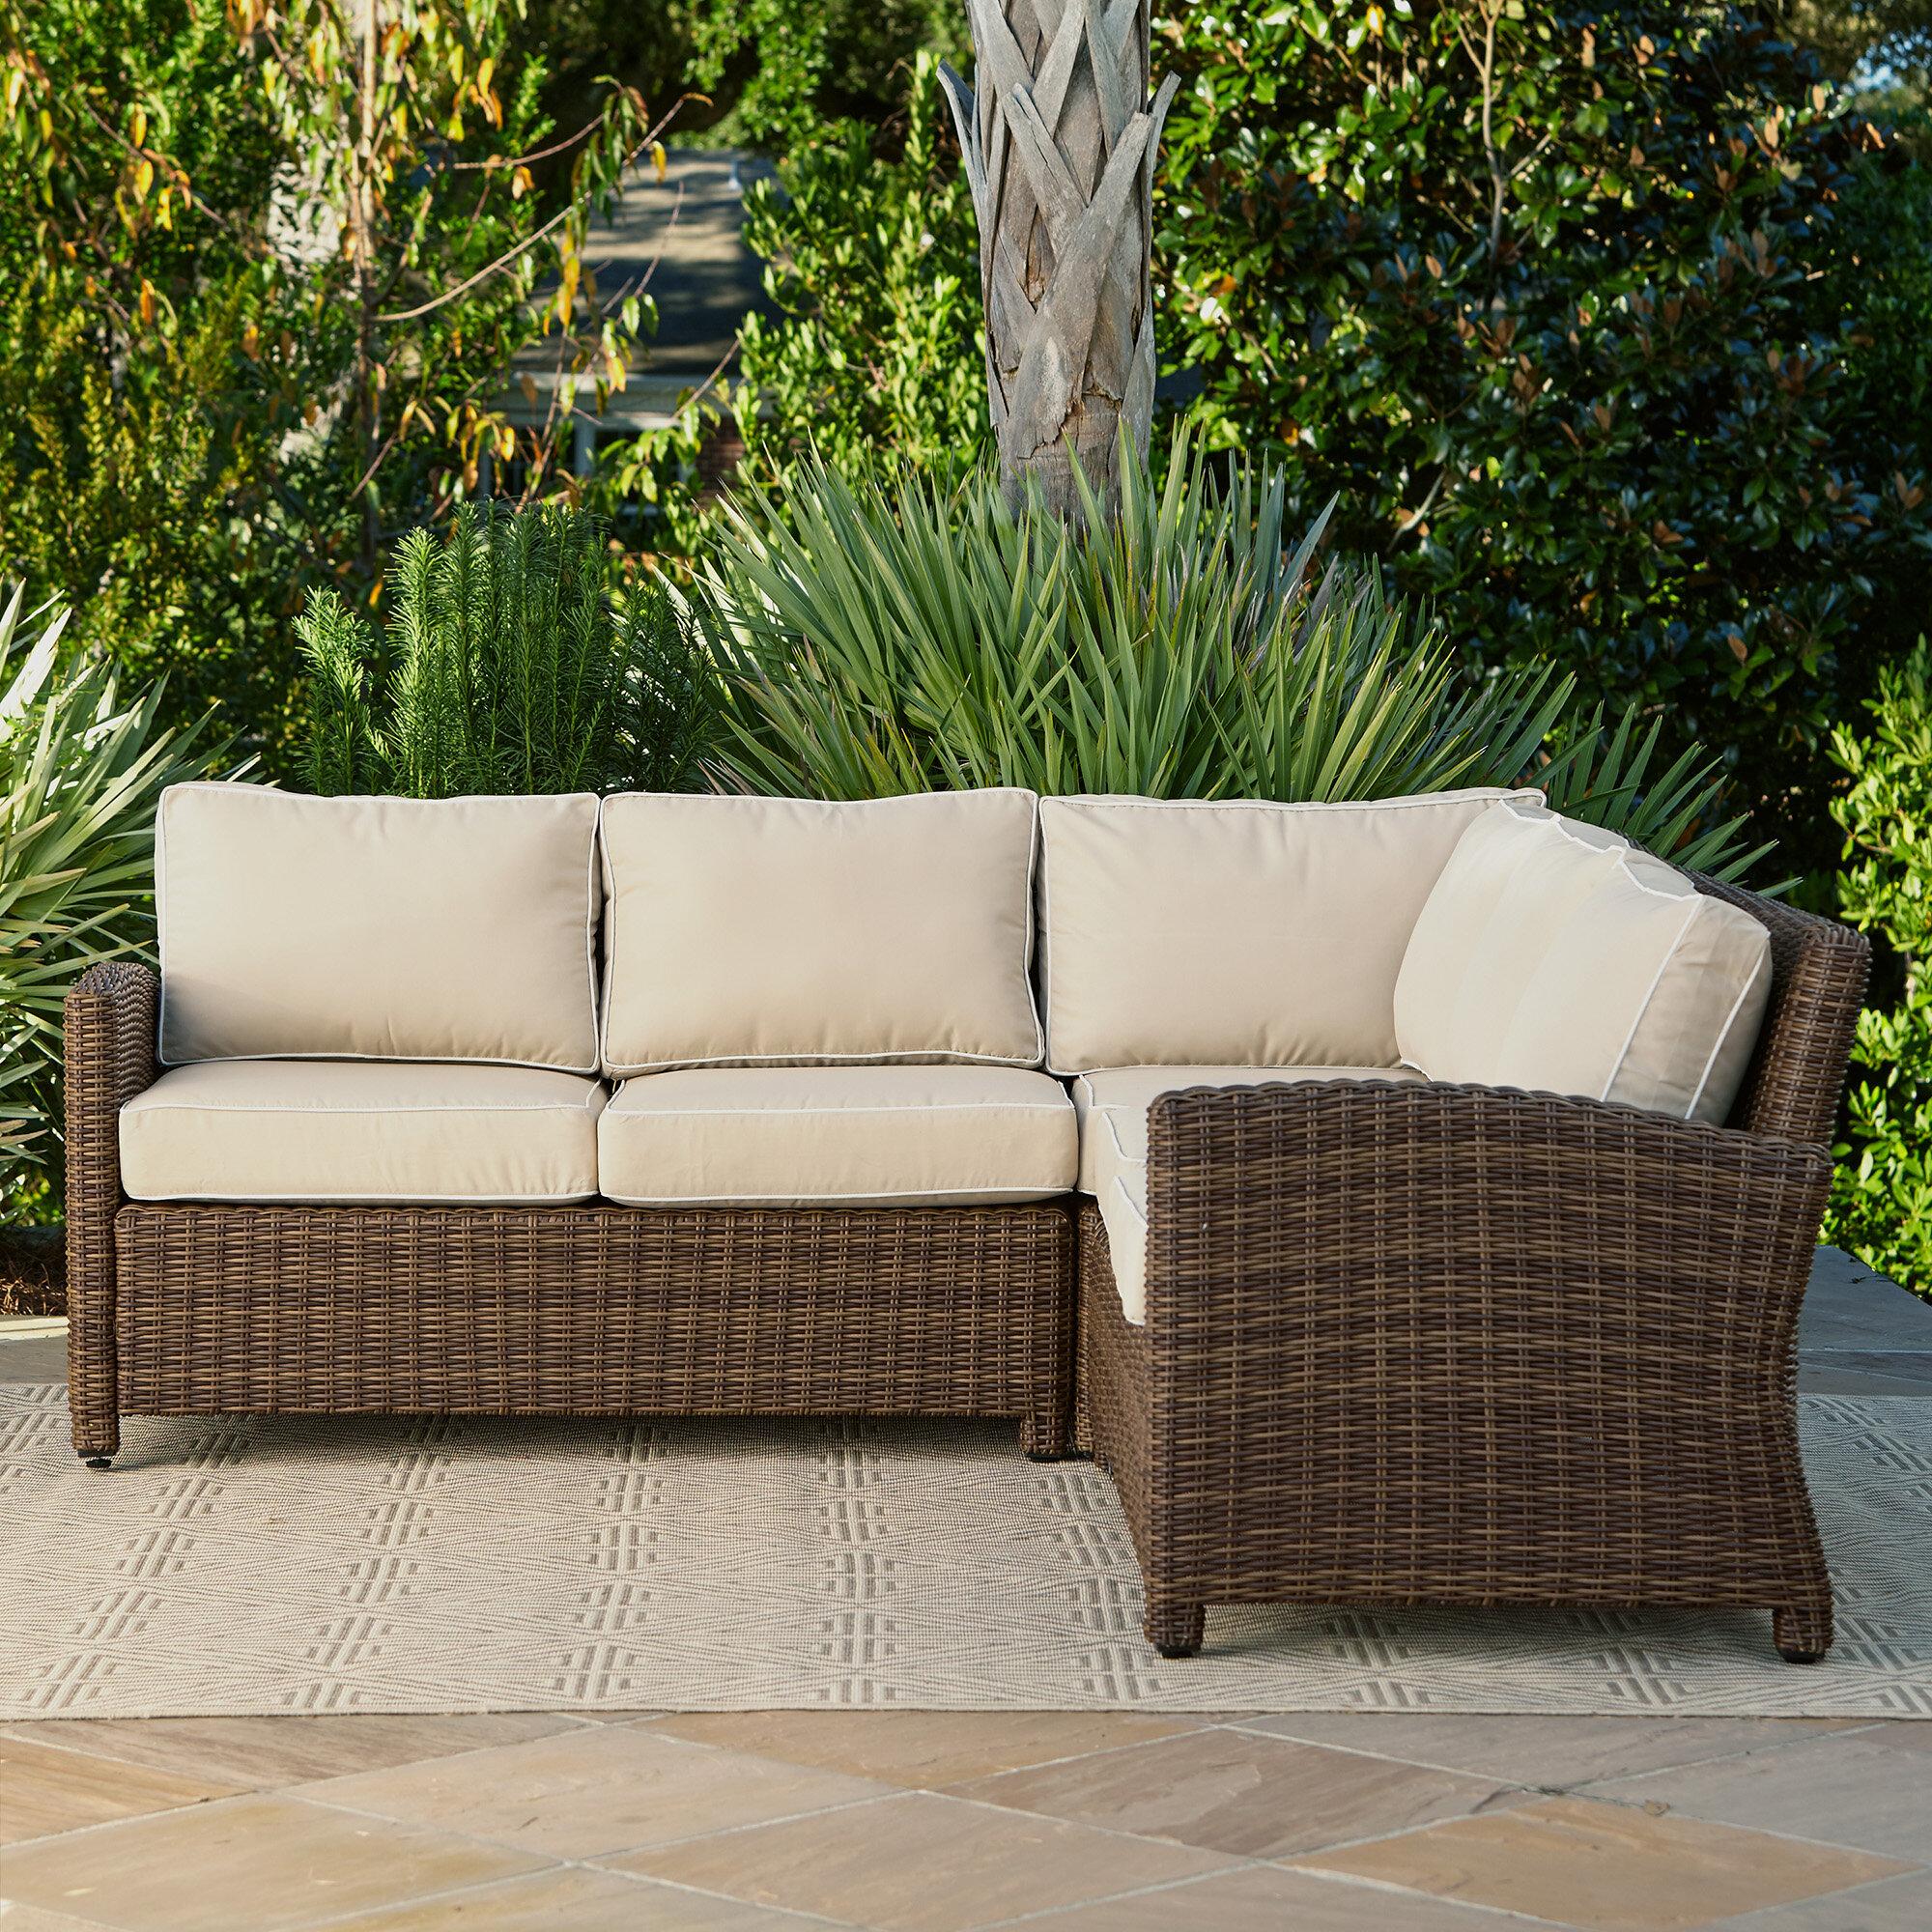 Beachcrest Home Kiana Patio Sectional With Cushions U0026 Reviews | Wayfair